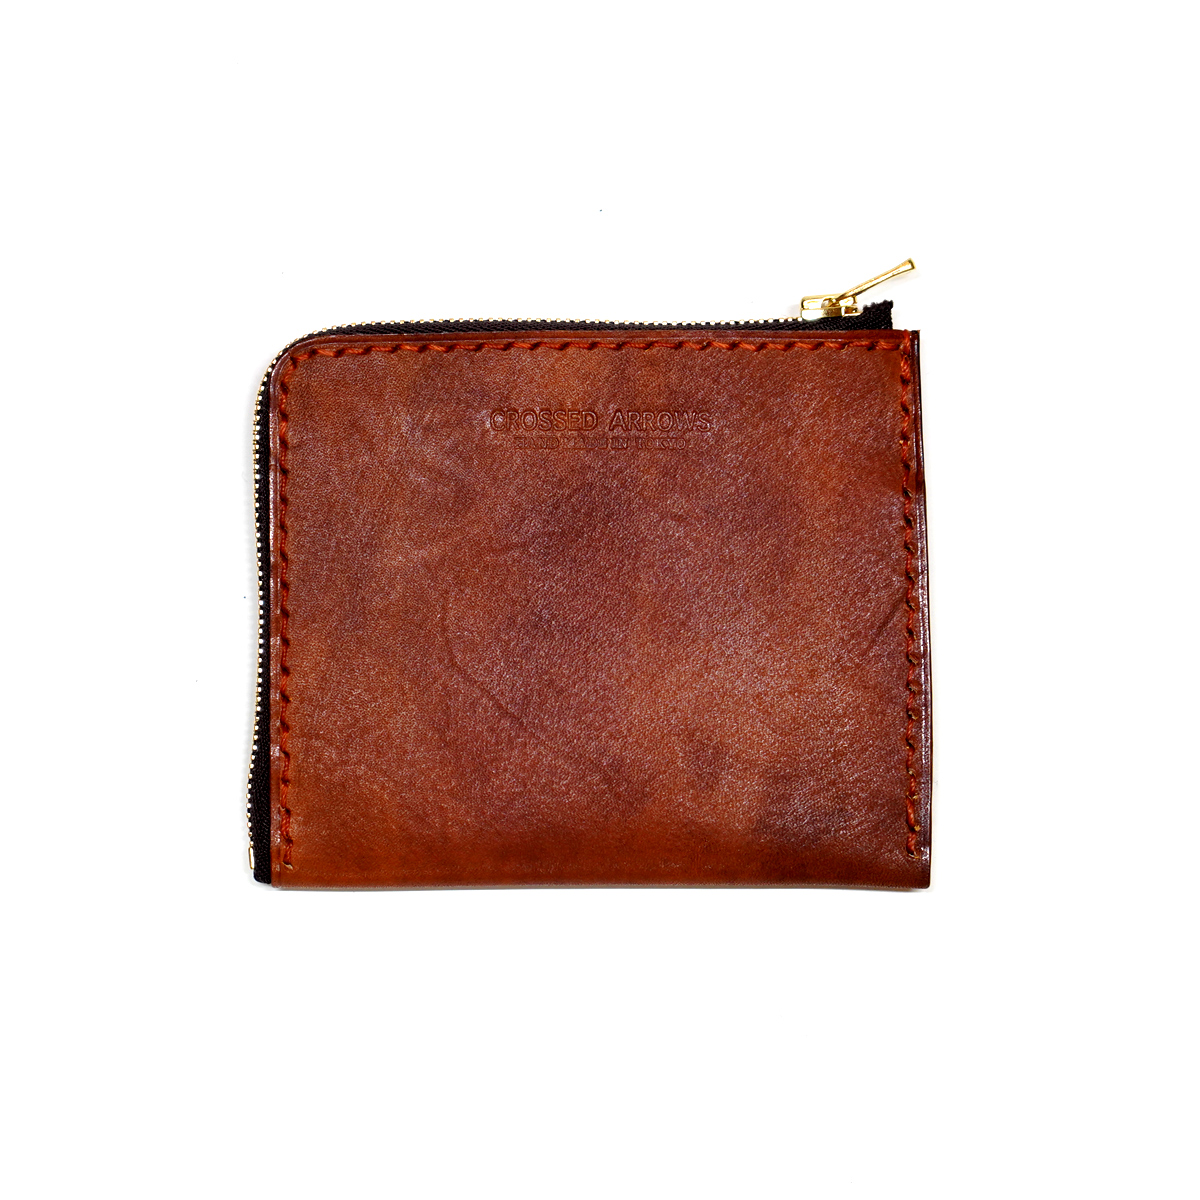 Grain leather L Zip Wallet